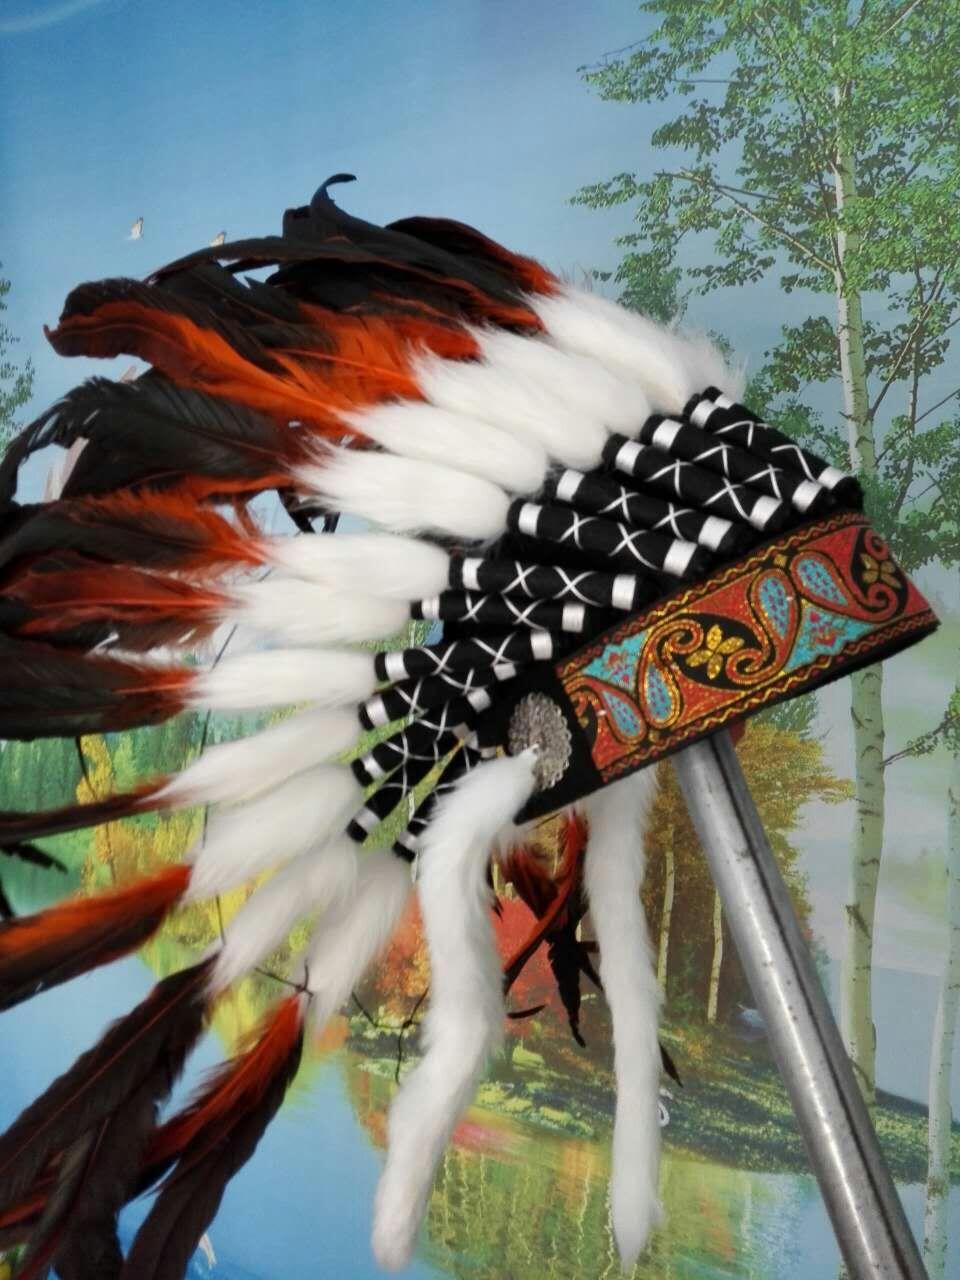 21inch orange feather Headdress headpiece feather hat halloween feather costumes